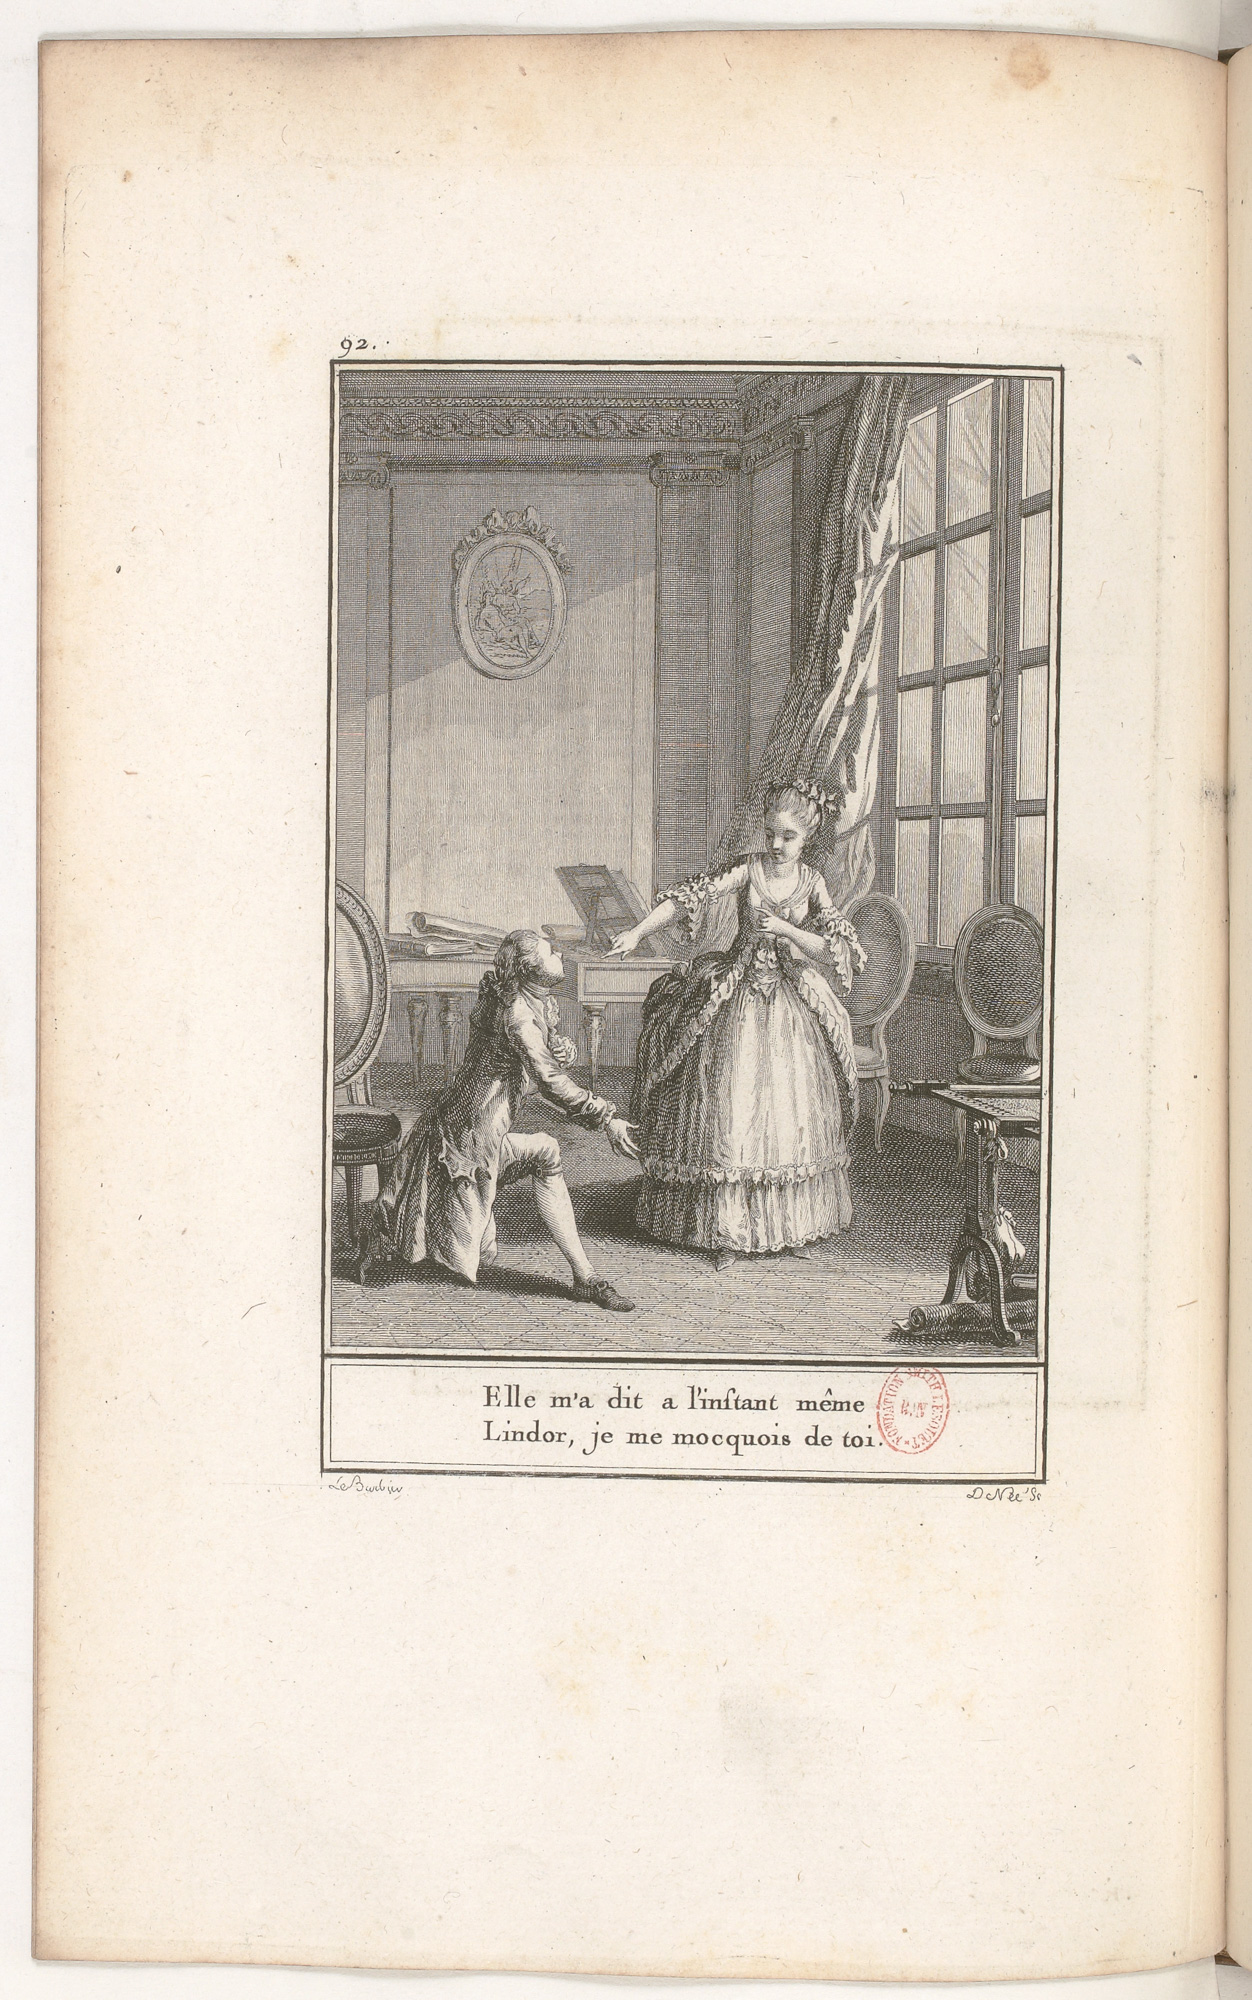 S.4.16 La capricieuse,1772, Image